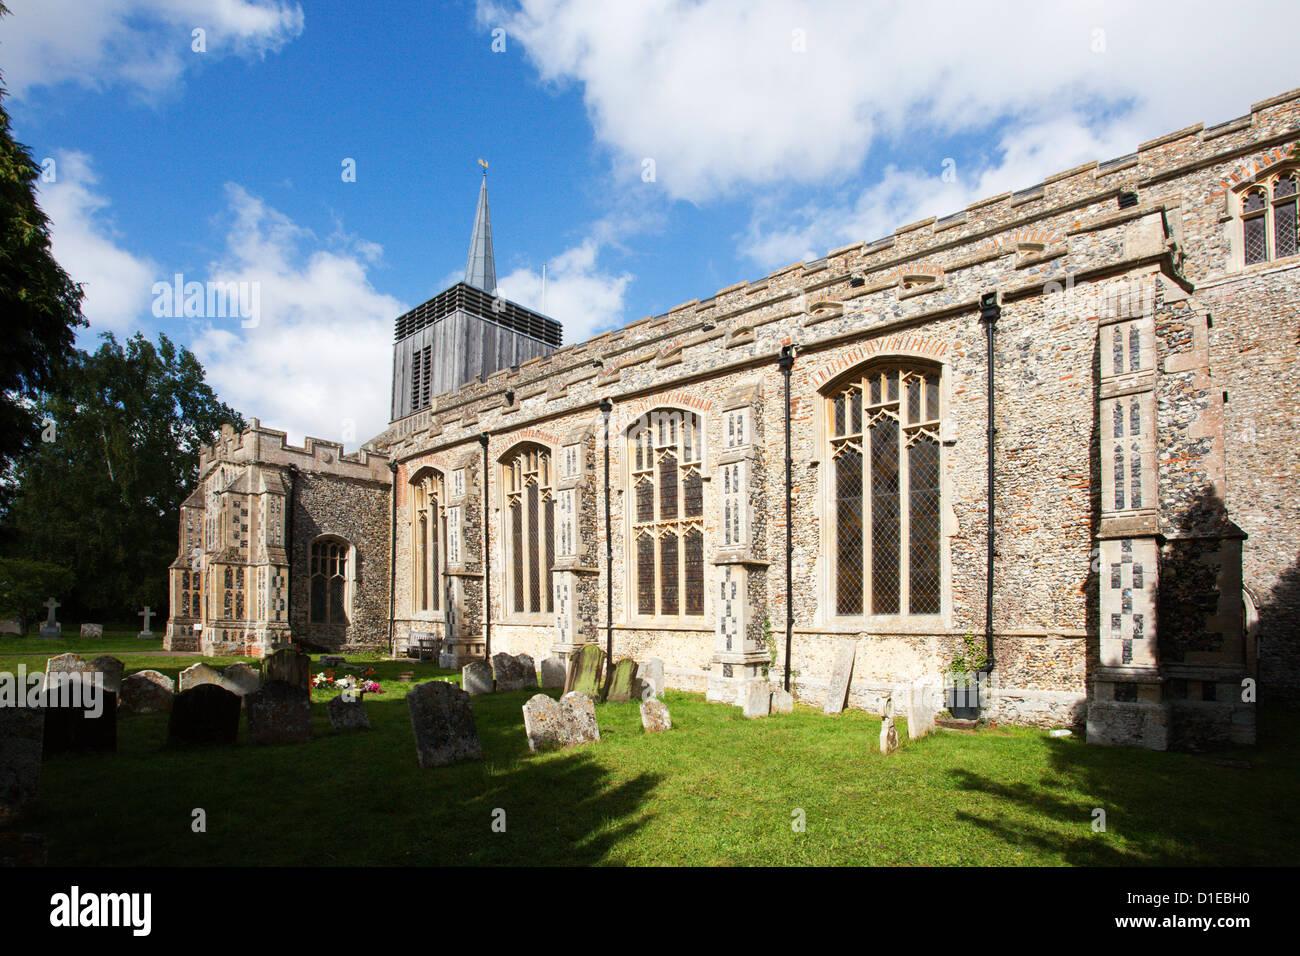 Church of St. Mary Magdelene, at Bildeston, Suffolk, England, United Kingdom, Europe - Stock Image